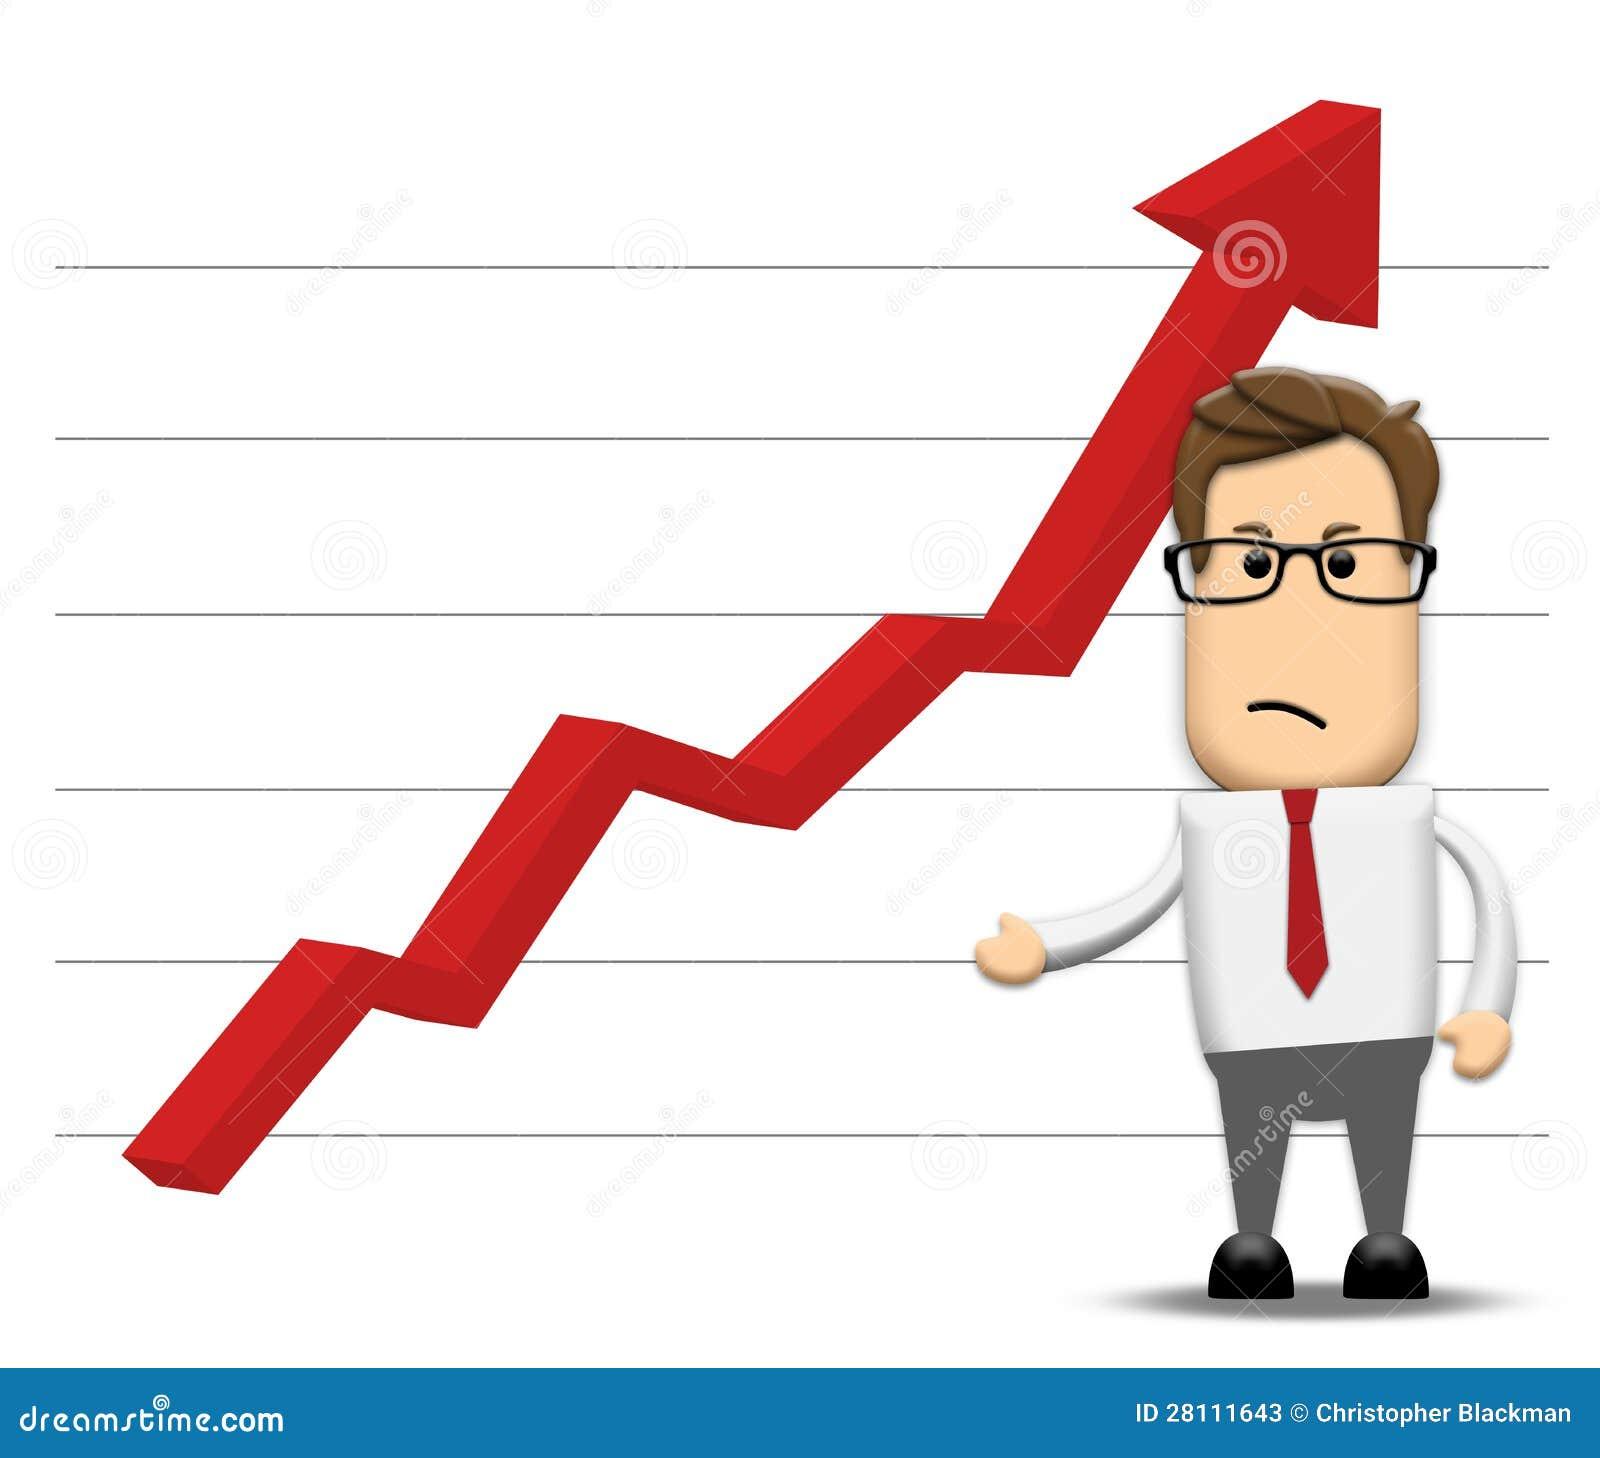 Graph Negatively Increasing Stock Photos - Image: 28111643